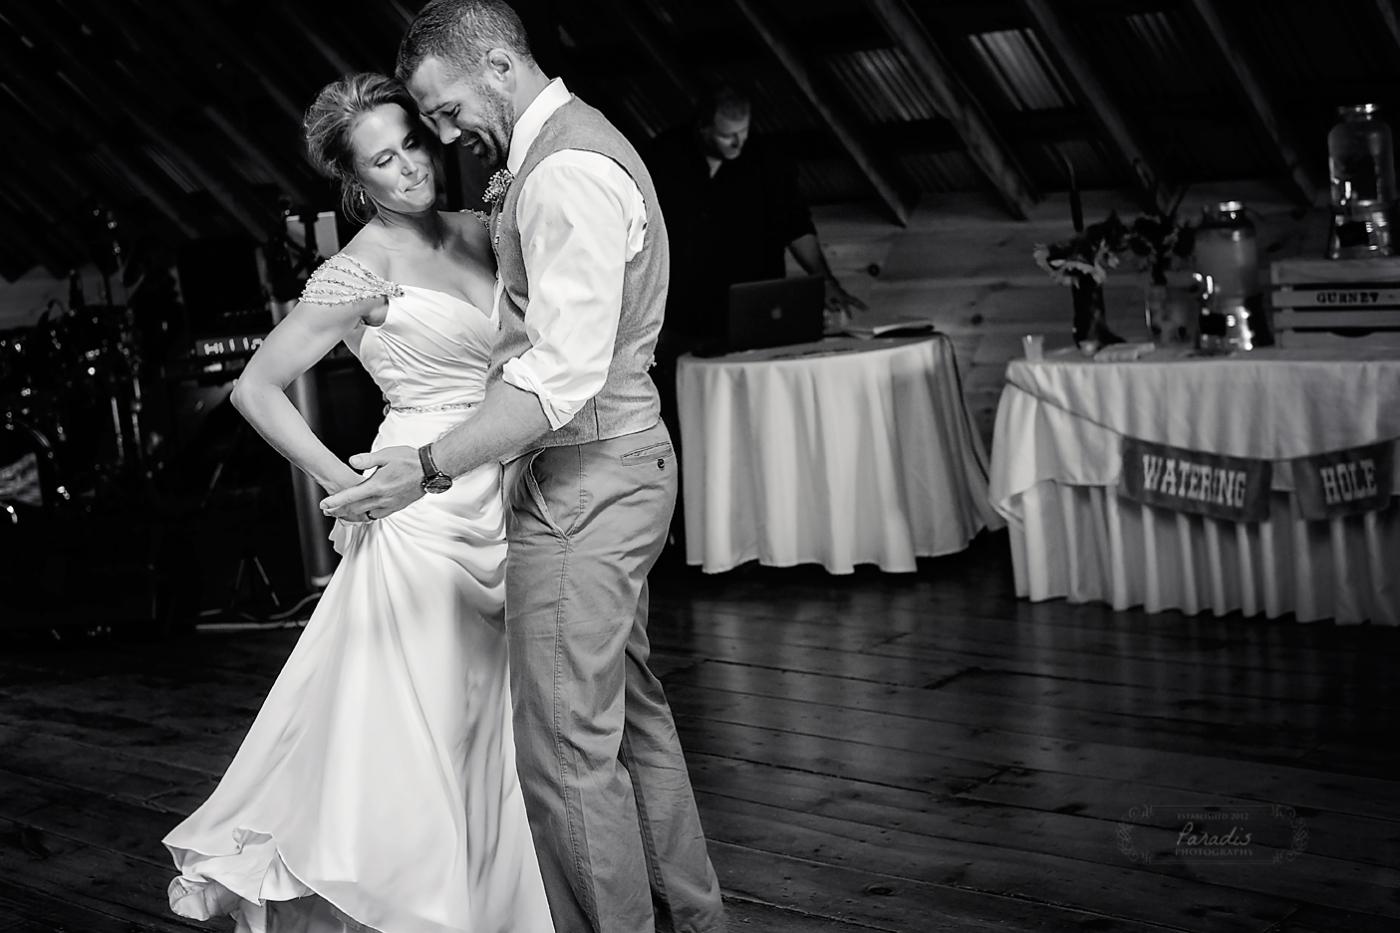 paradis photography maine wedding photographer saco bride groom first dance